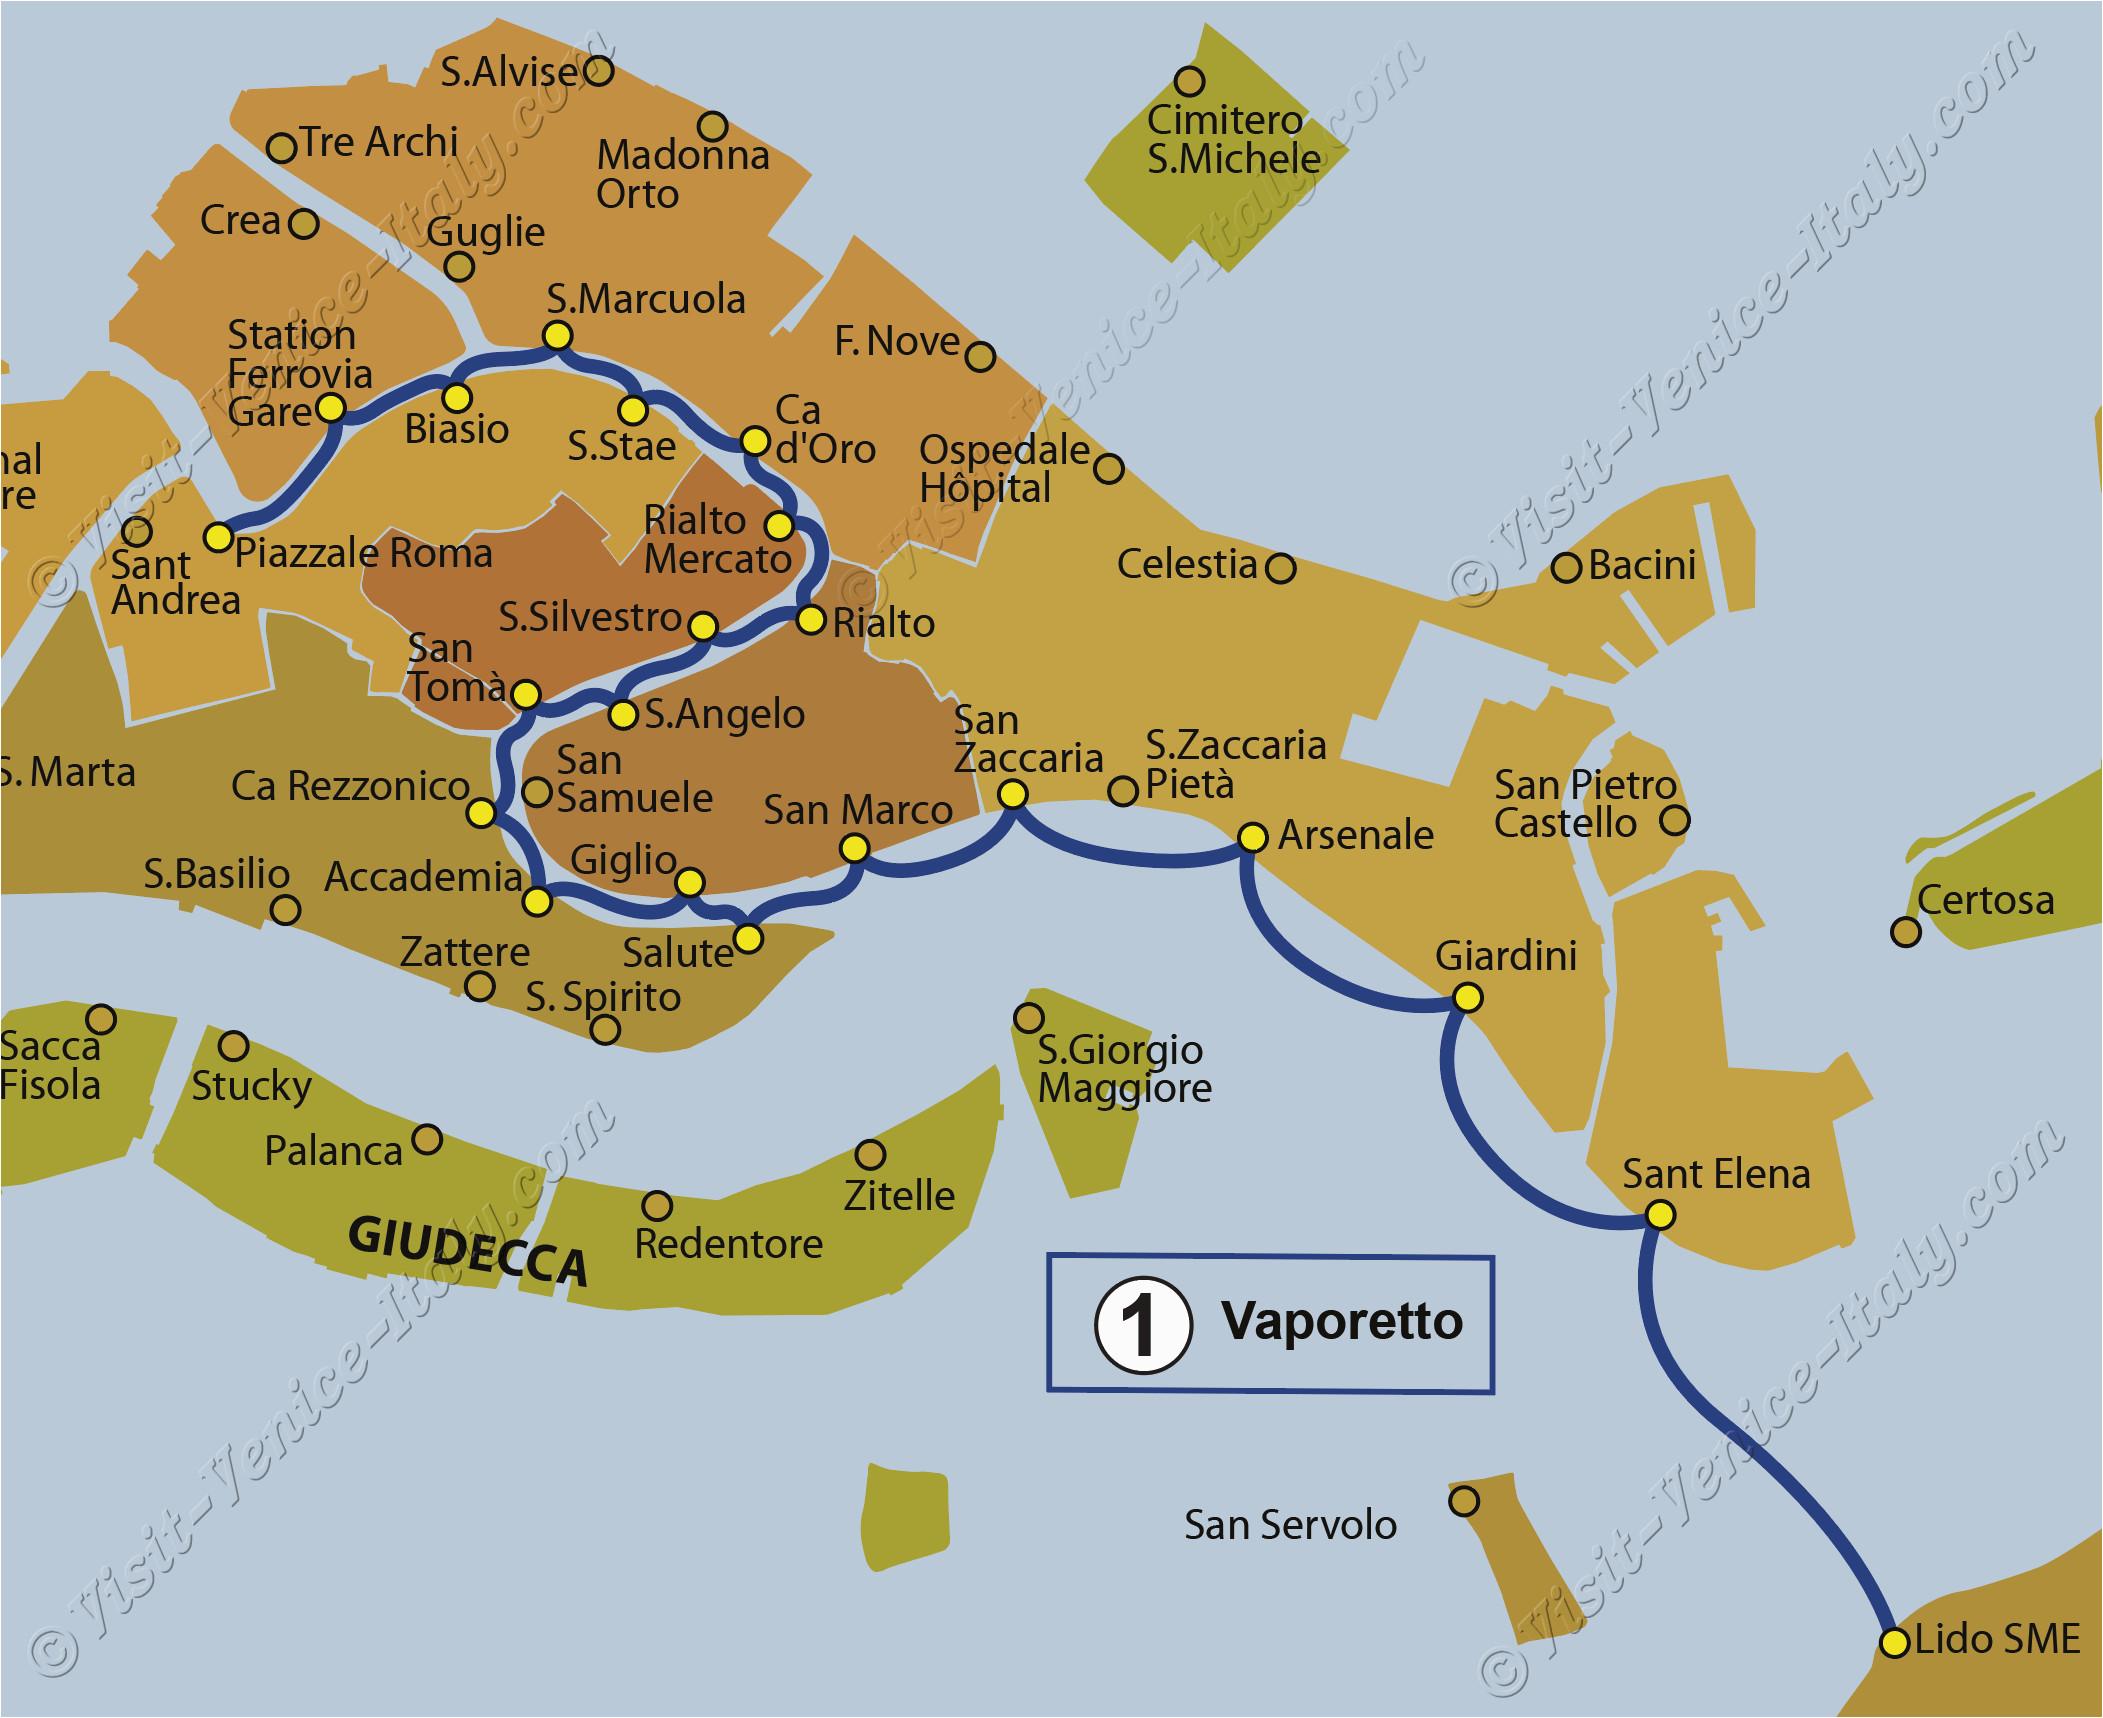 transport vaporetto waterbus bus lines maps venice italy